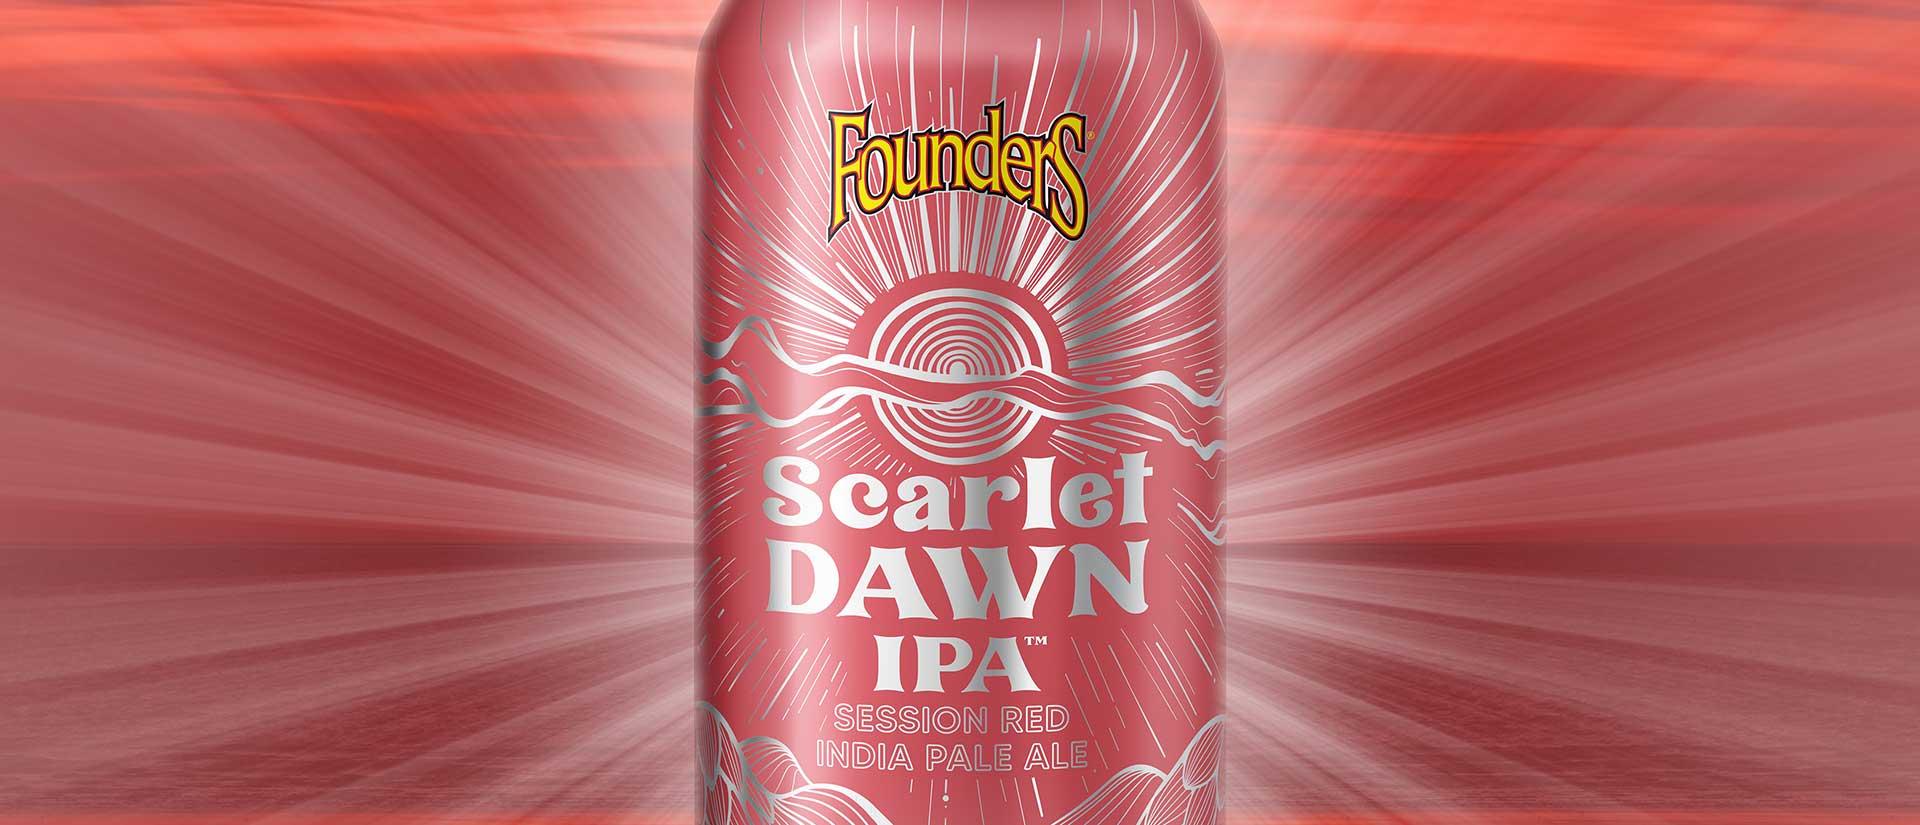 scarlet dawn announce slider 2021